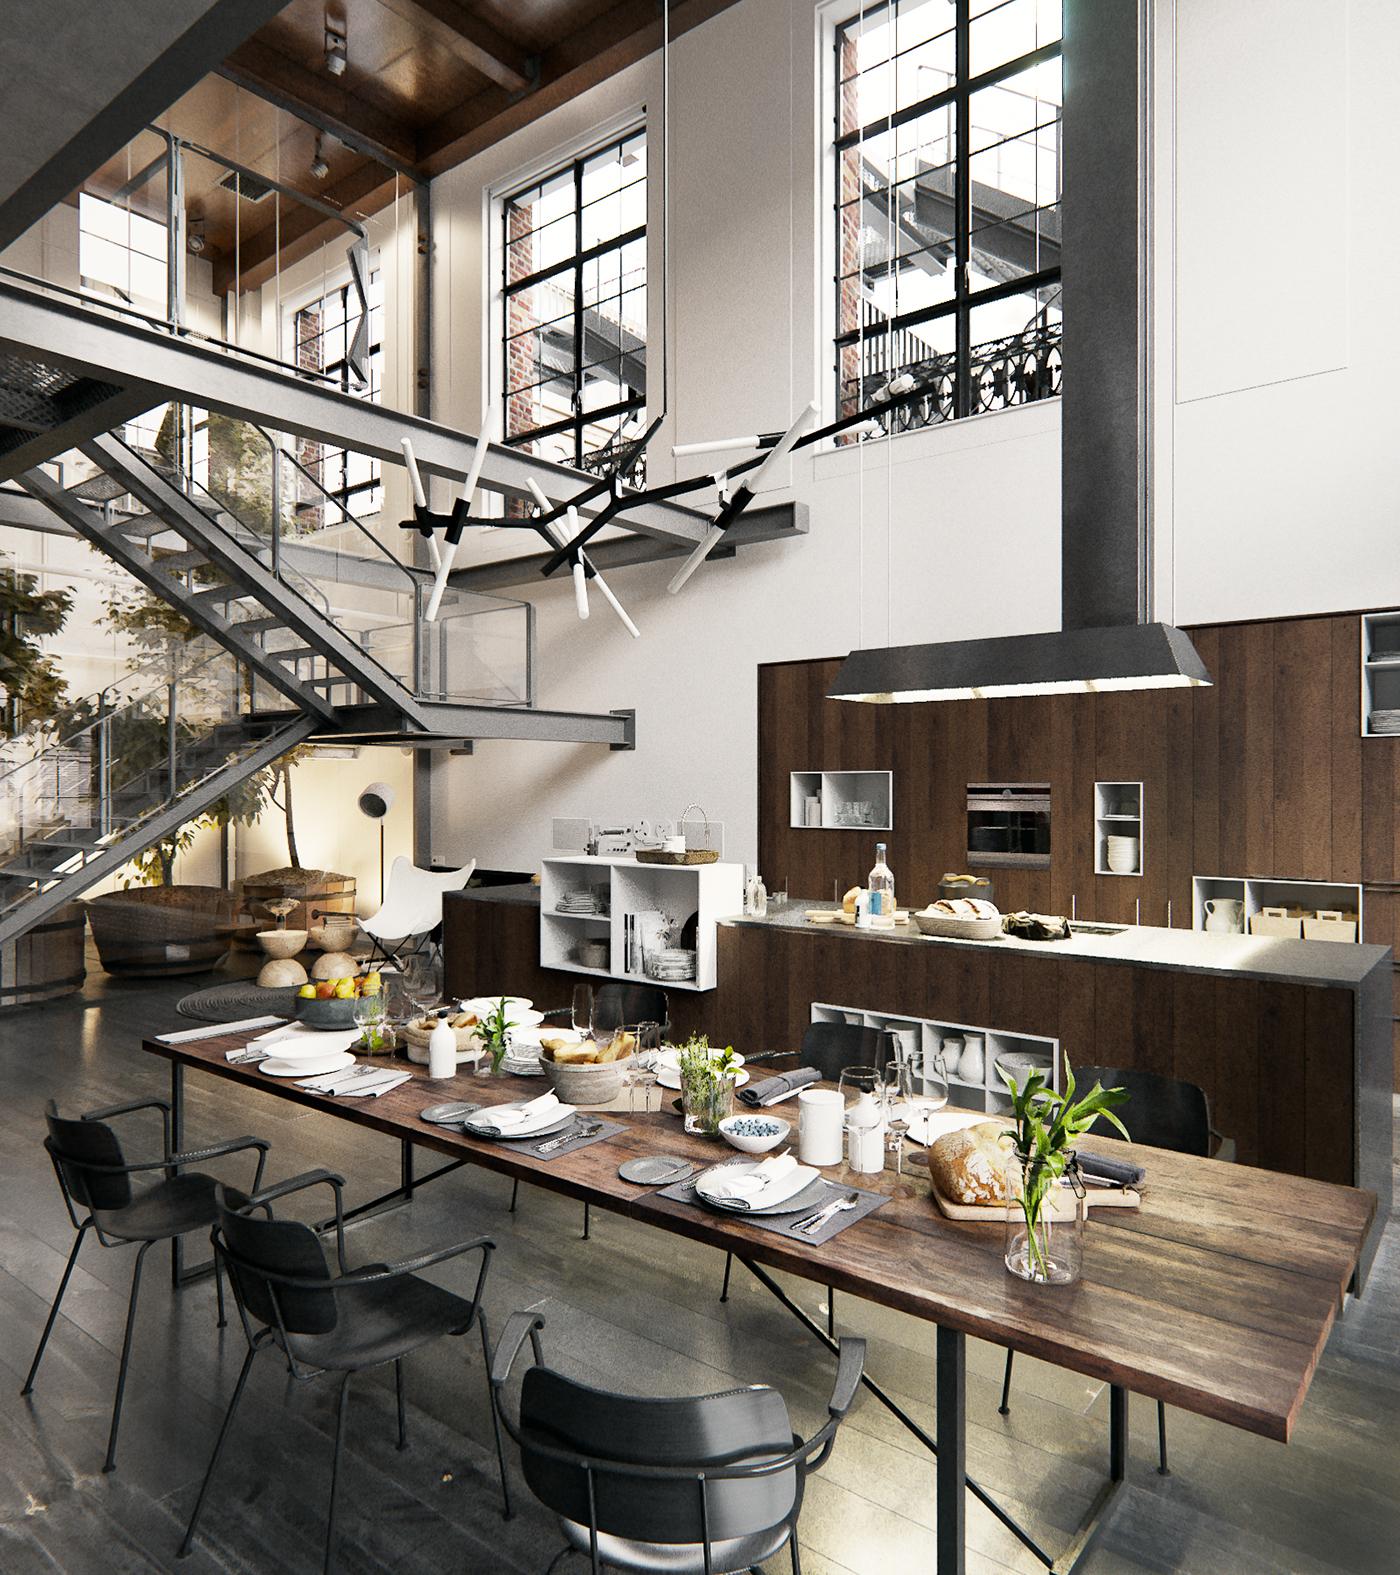 New York Loft Rentals: Loft Studios Project In New York City On Behance